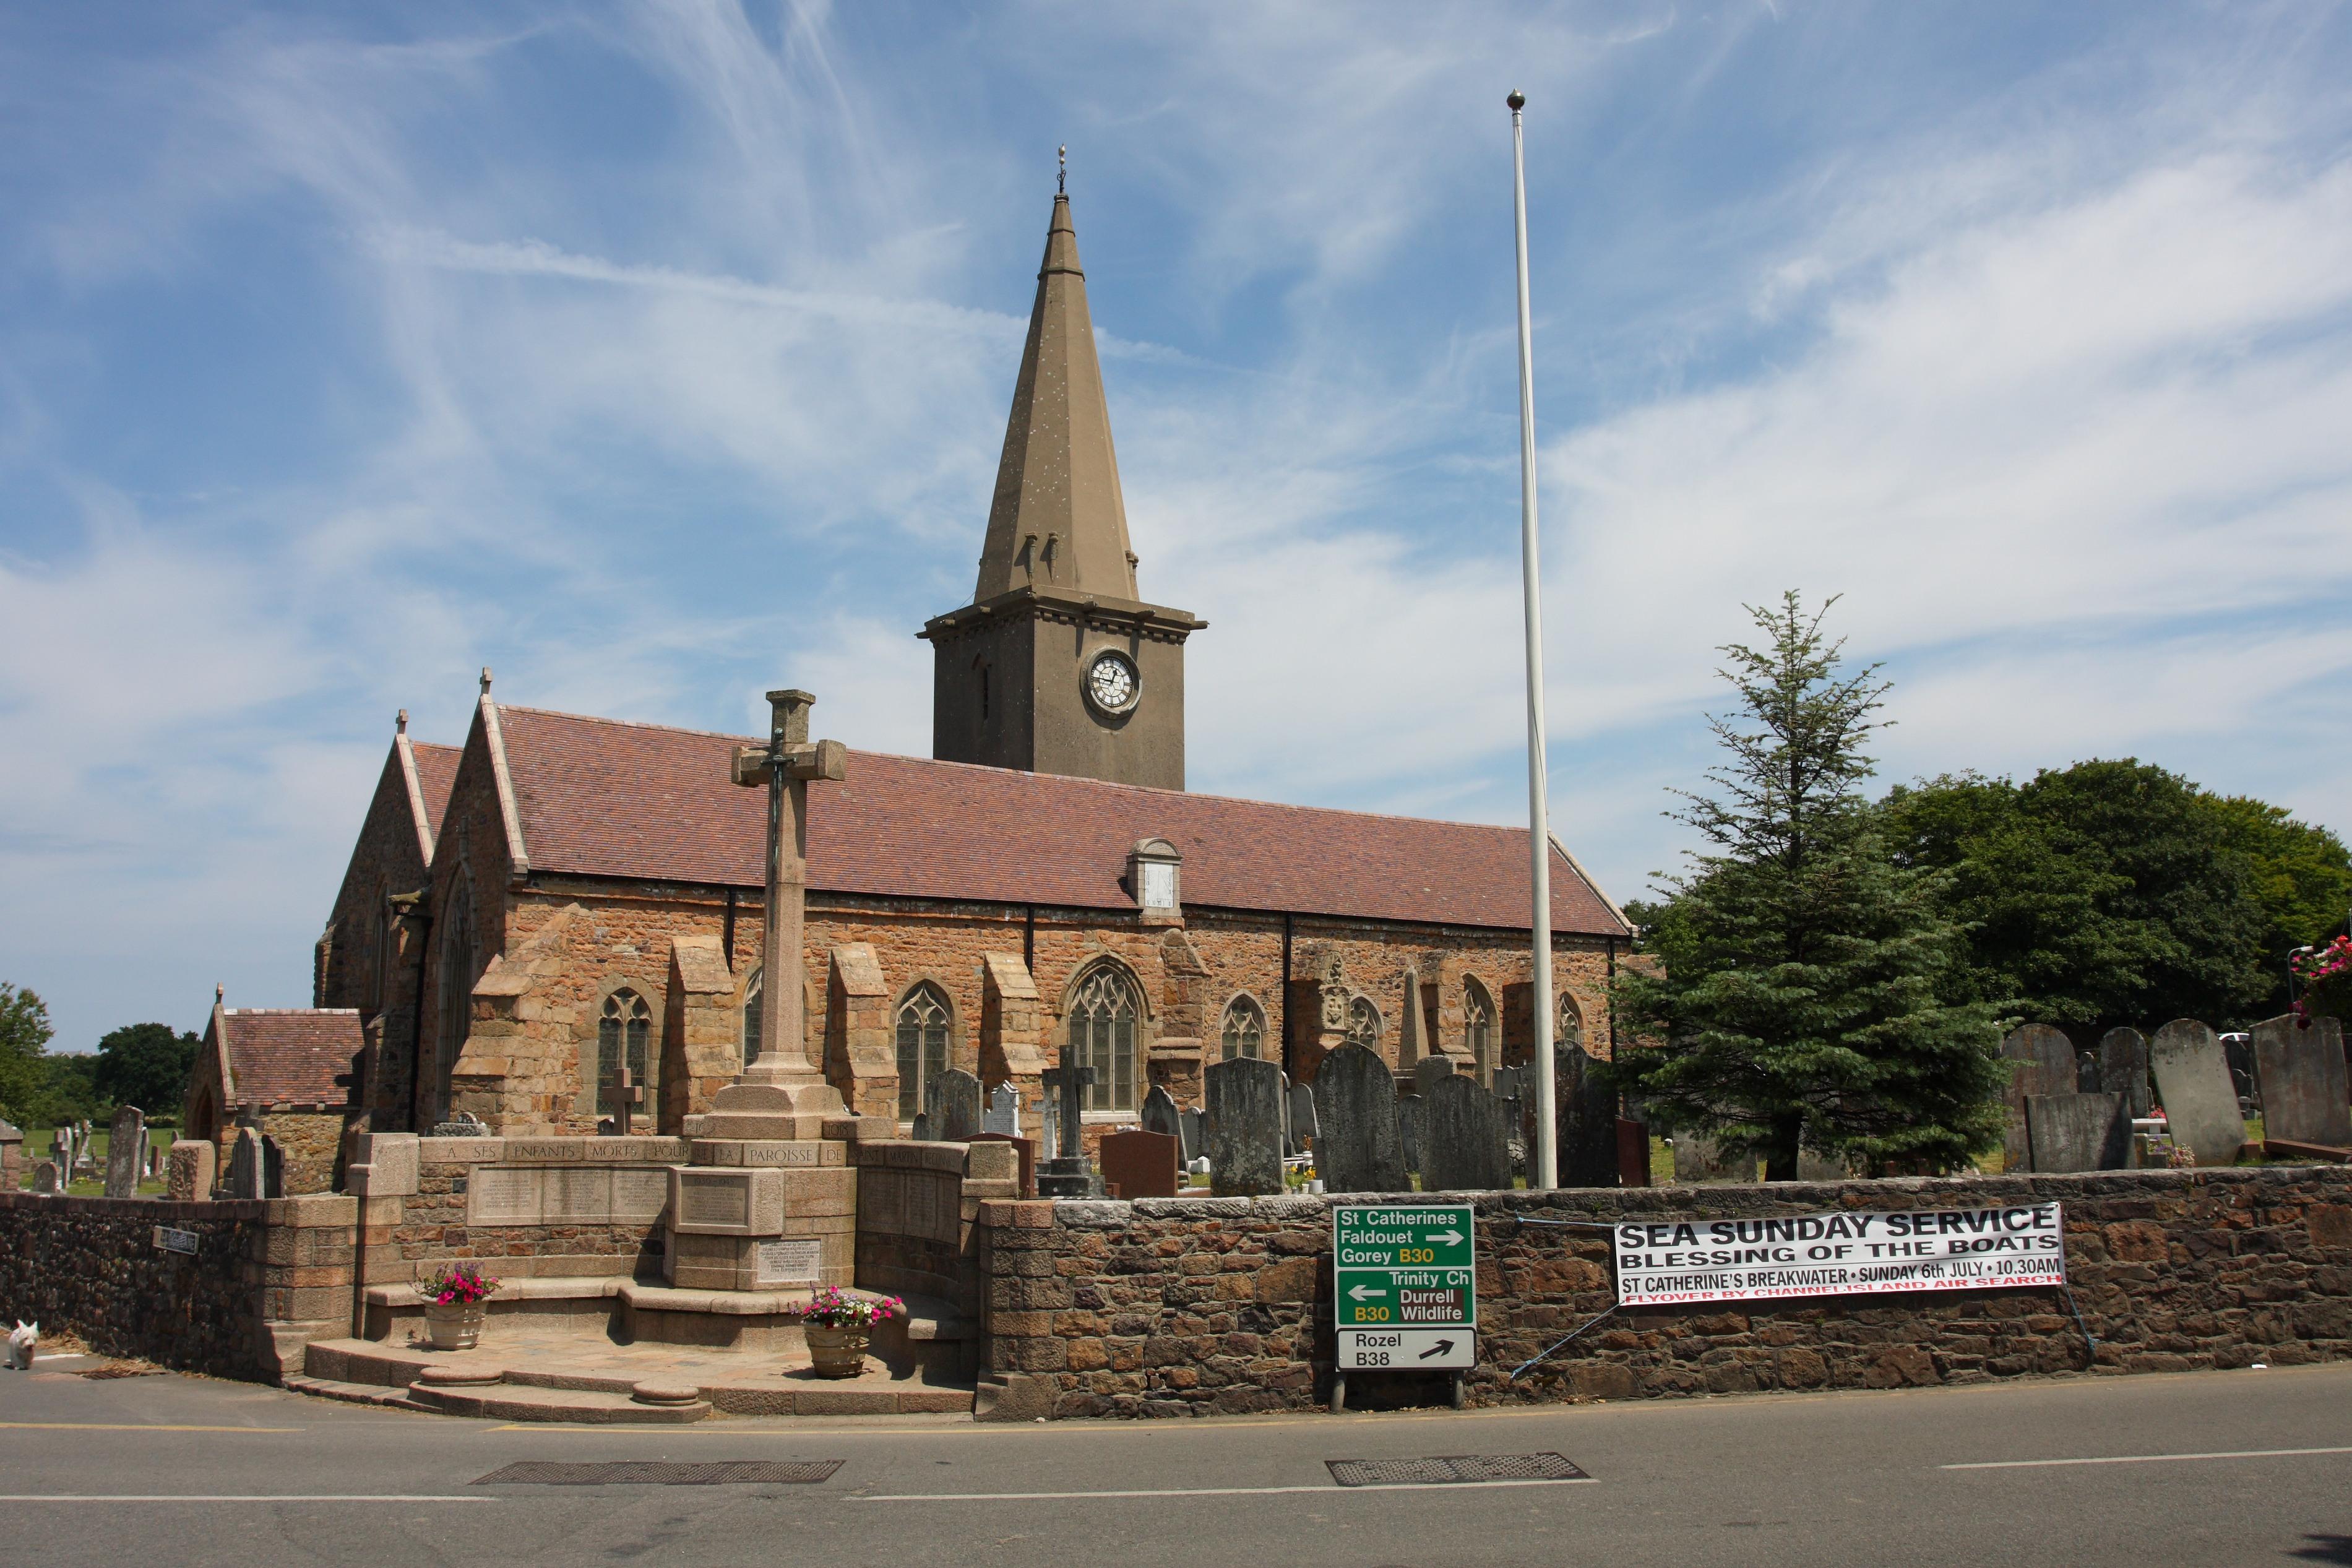 File:St Martins Church Jersey.JPG - Wikimedia Commons